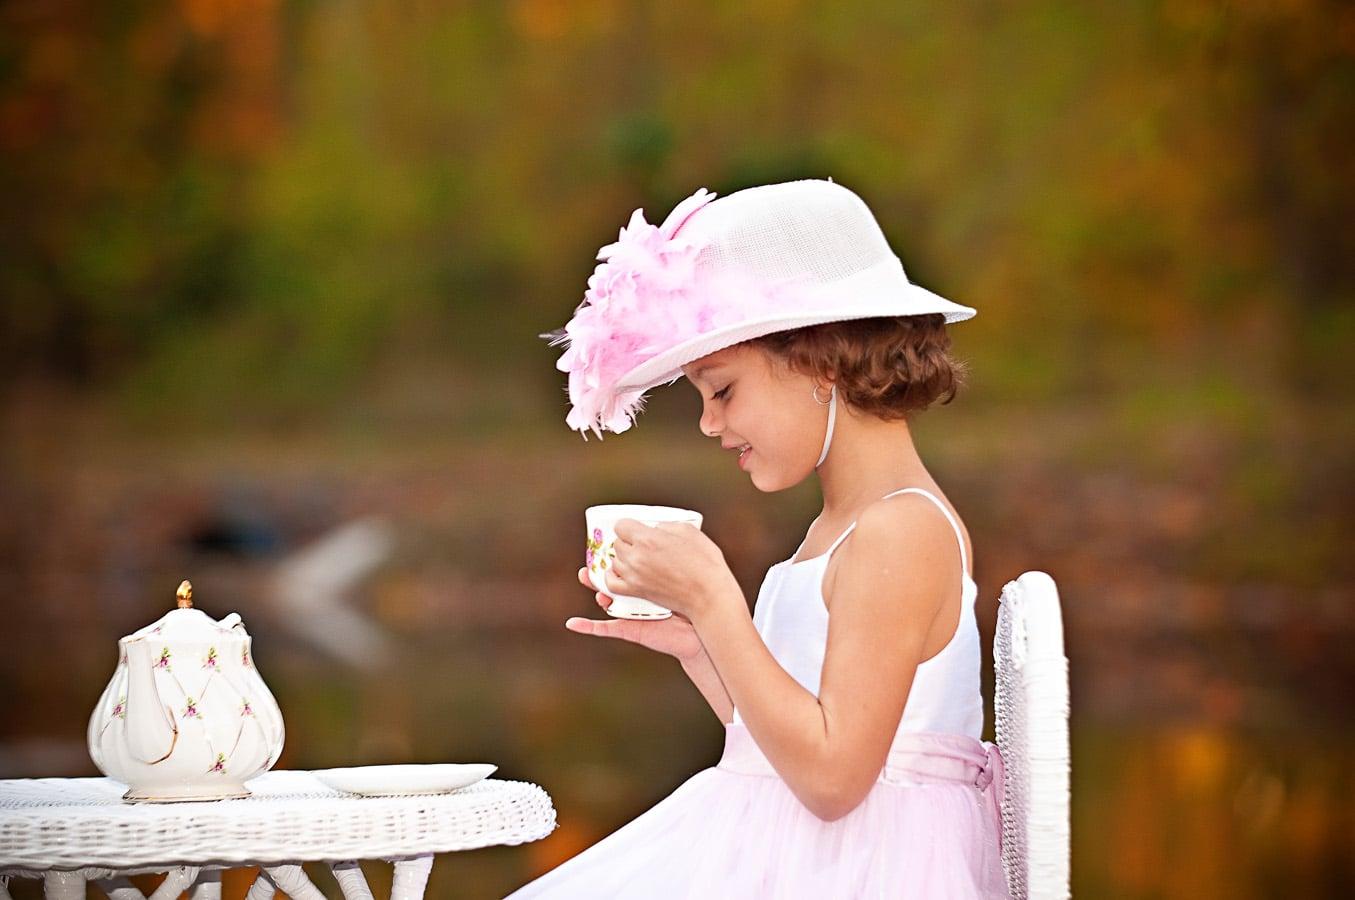 child, portrait, outdoor, tea party, natural light, Northern VA